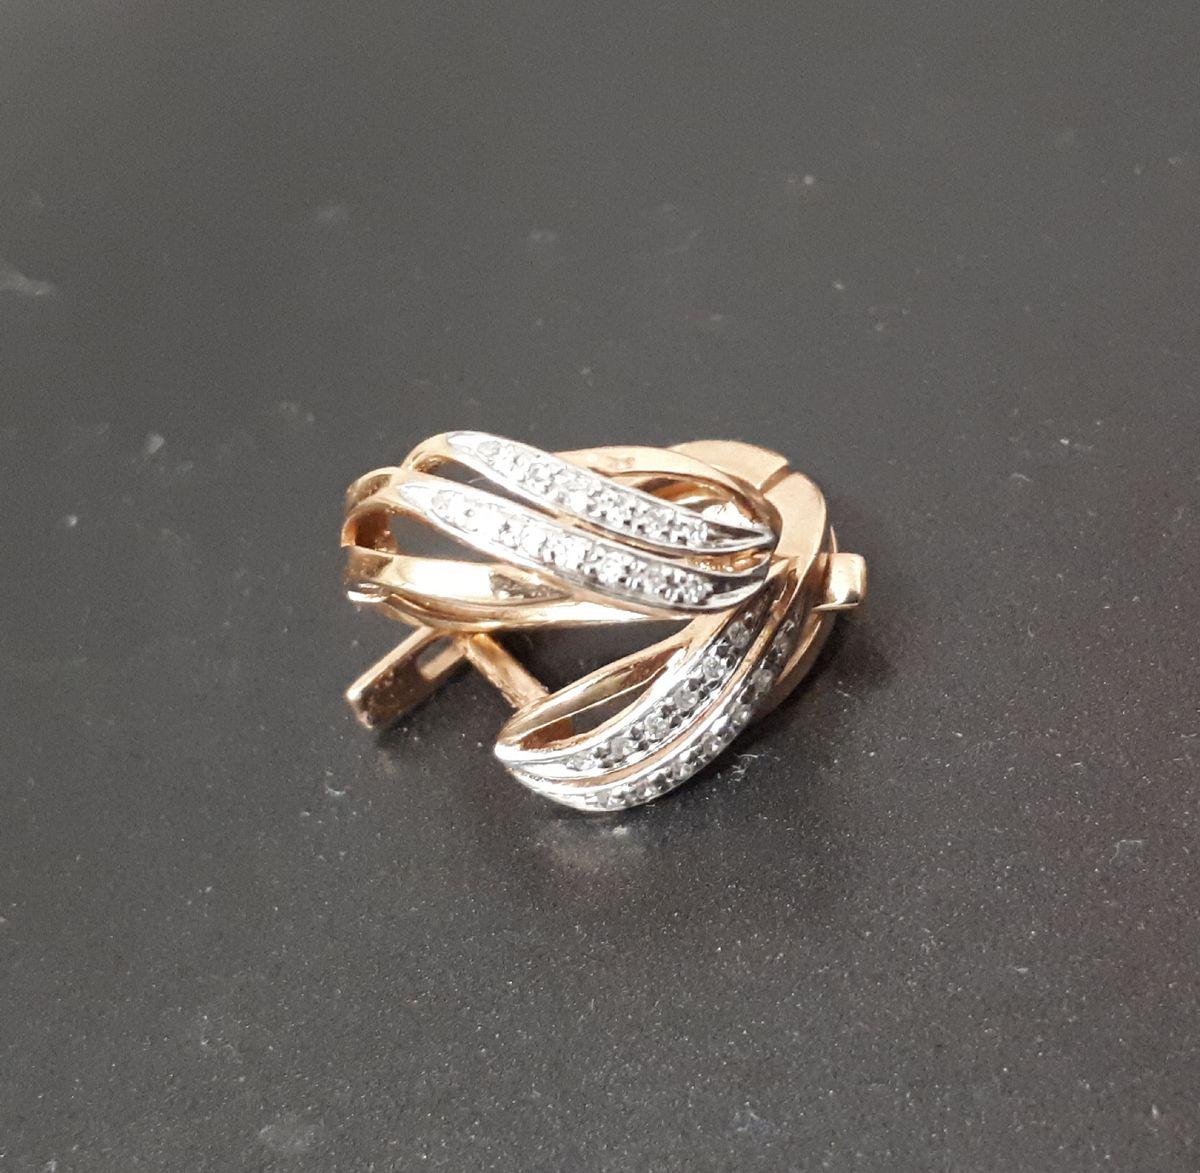 Серьги розовое золото с 26 бриллиантами